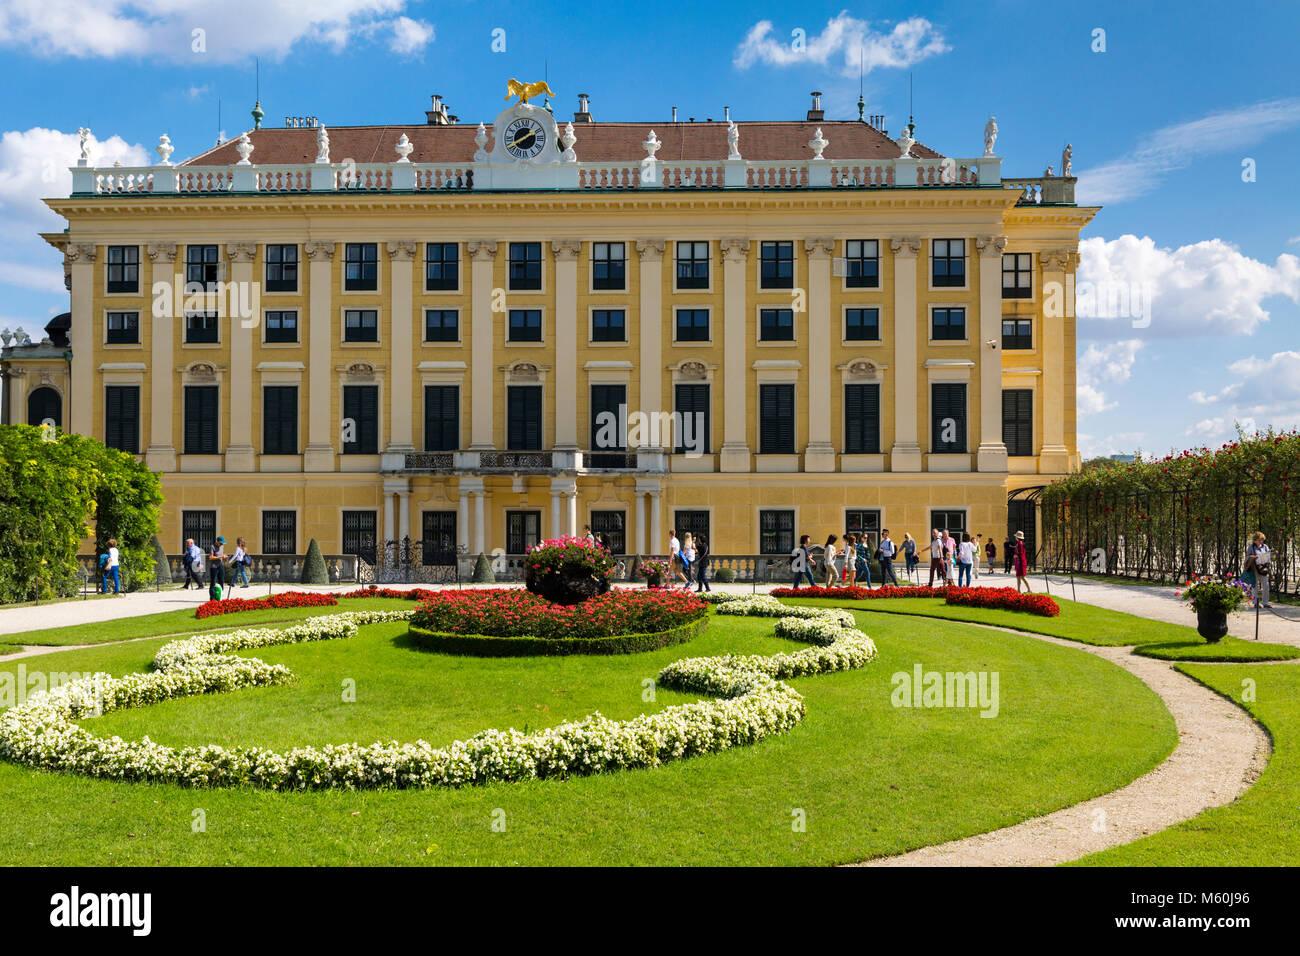 Il Palazzo di Schönbrunn giardini, Schonbrunn, Vienna, Austria. Immagini Stock